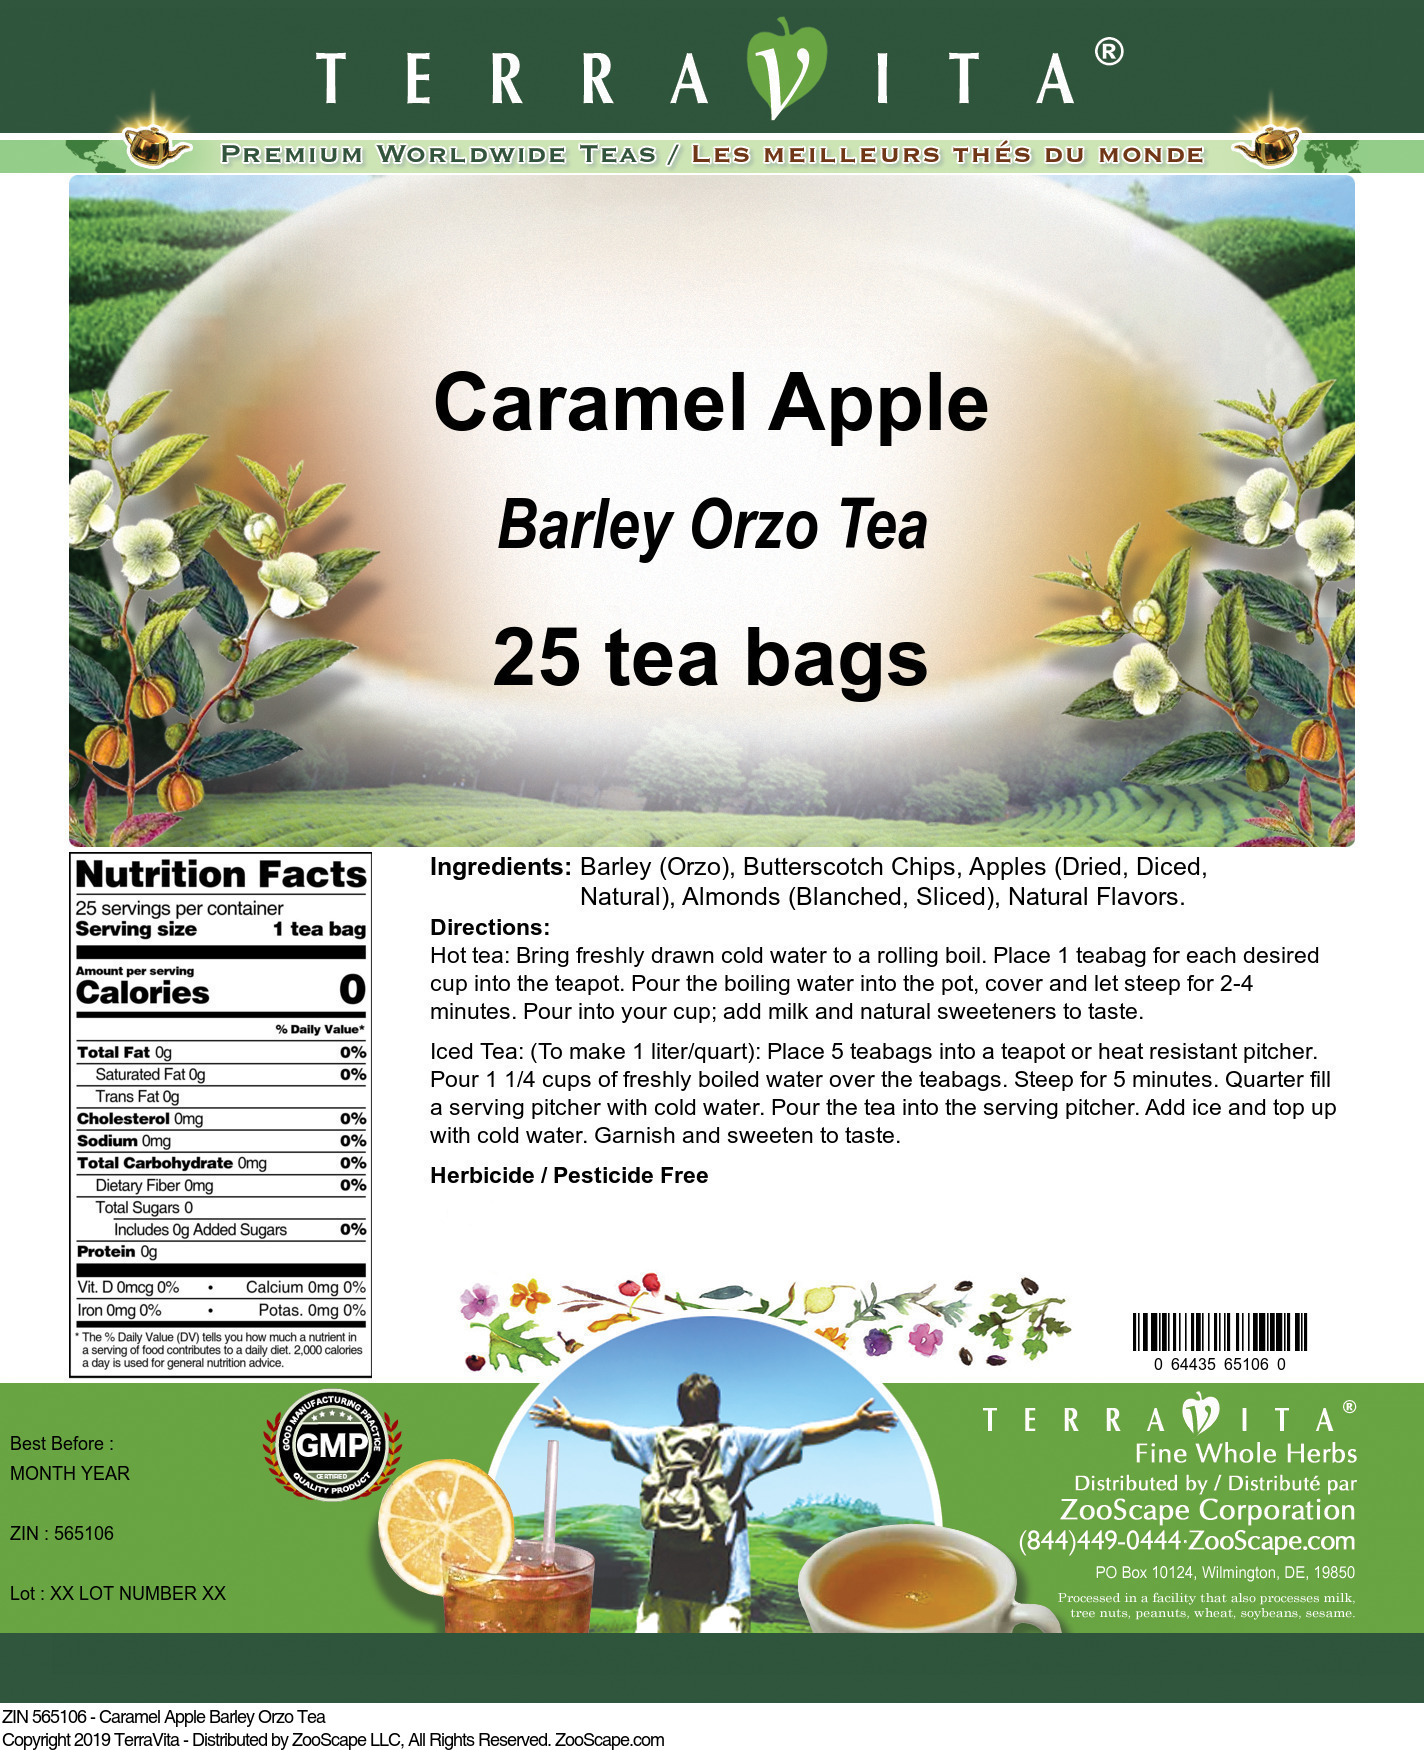 Caramel Apple Barley Orzo Tea